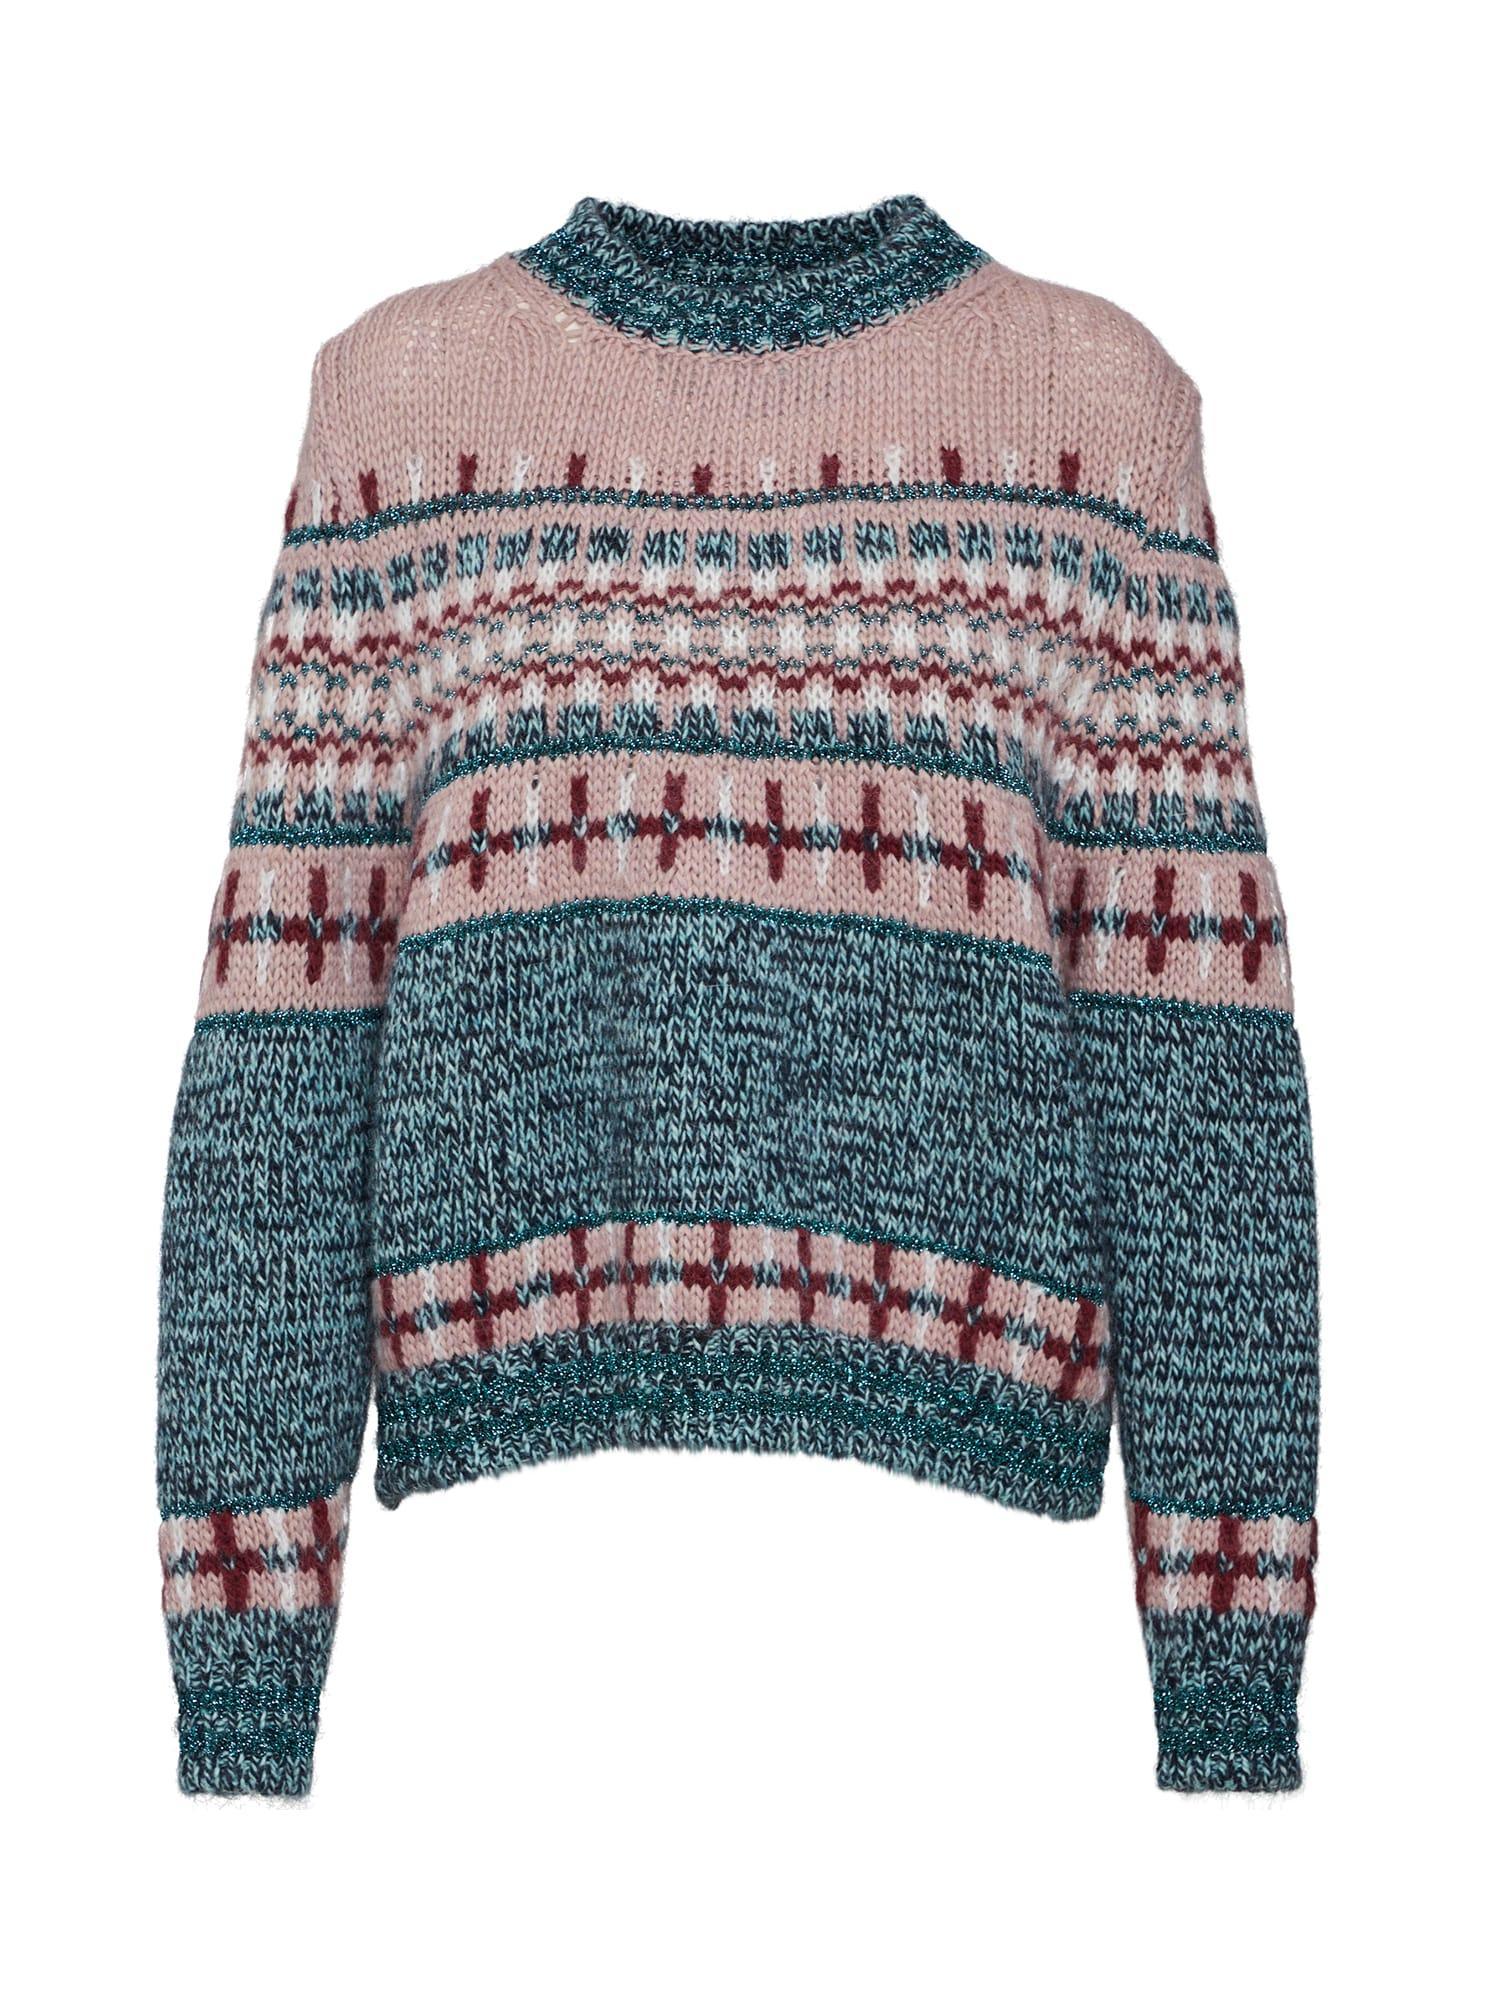 Svetr Rochers jacquard sweater zelená růžová Essentiel Antwerp